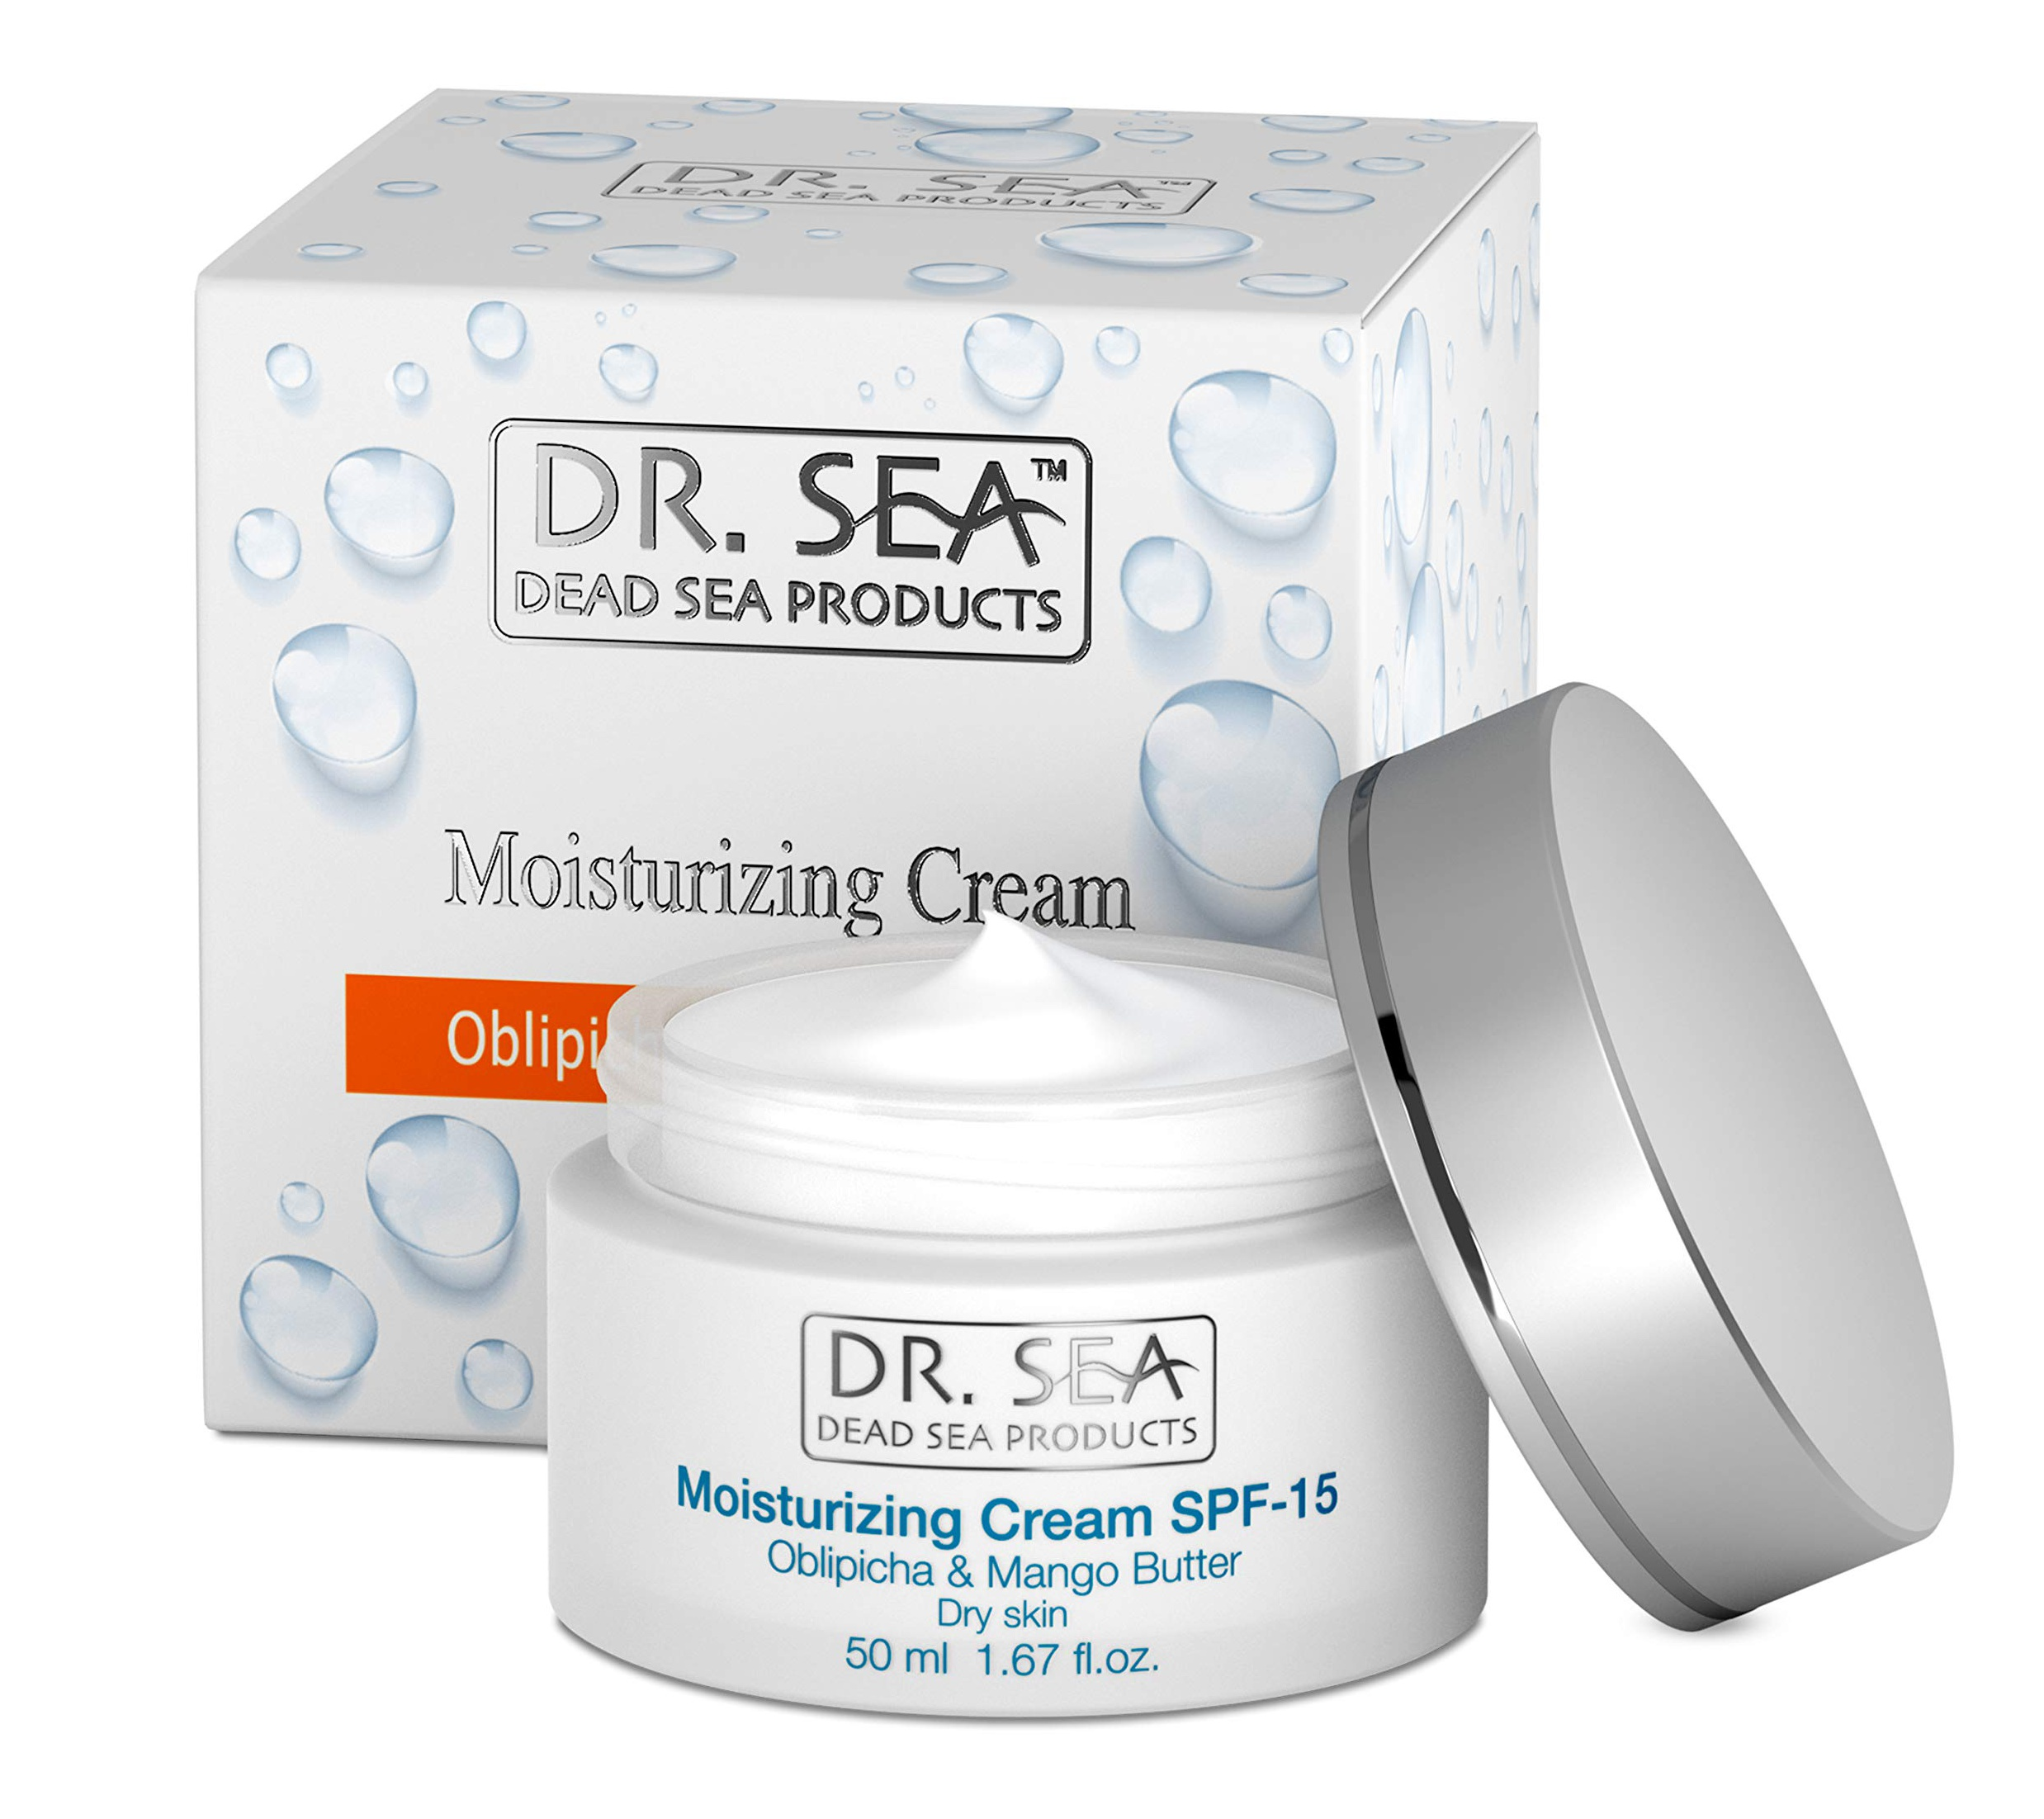 DR. SEA Moisturizing Cream Oblipicha & Mango For Dry Skin